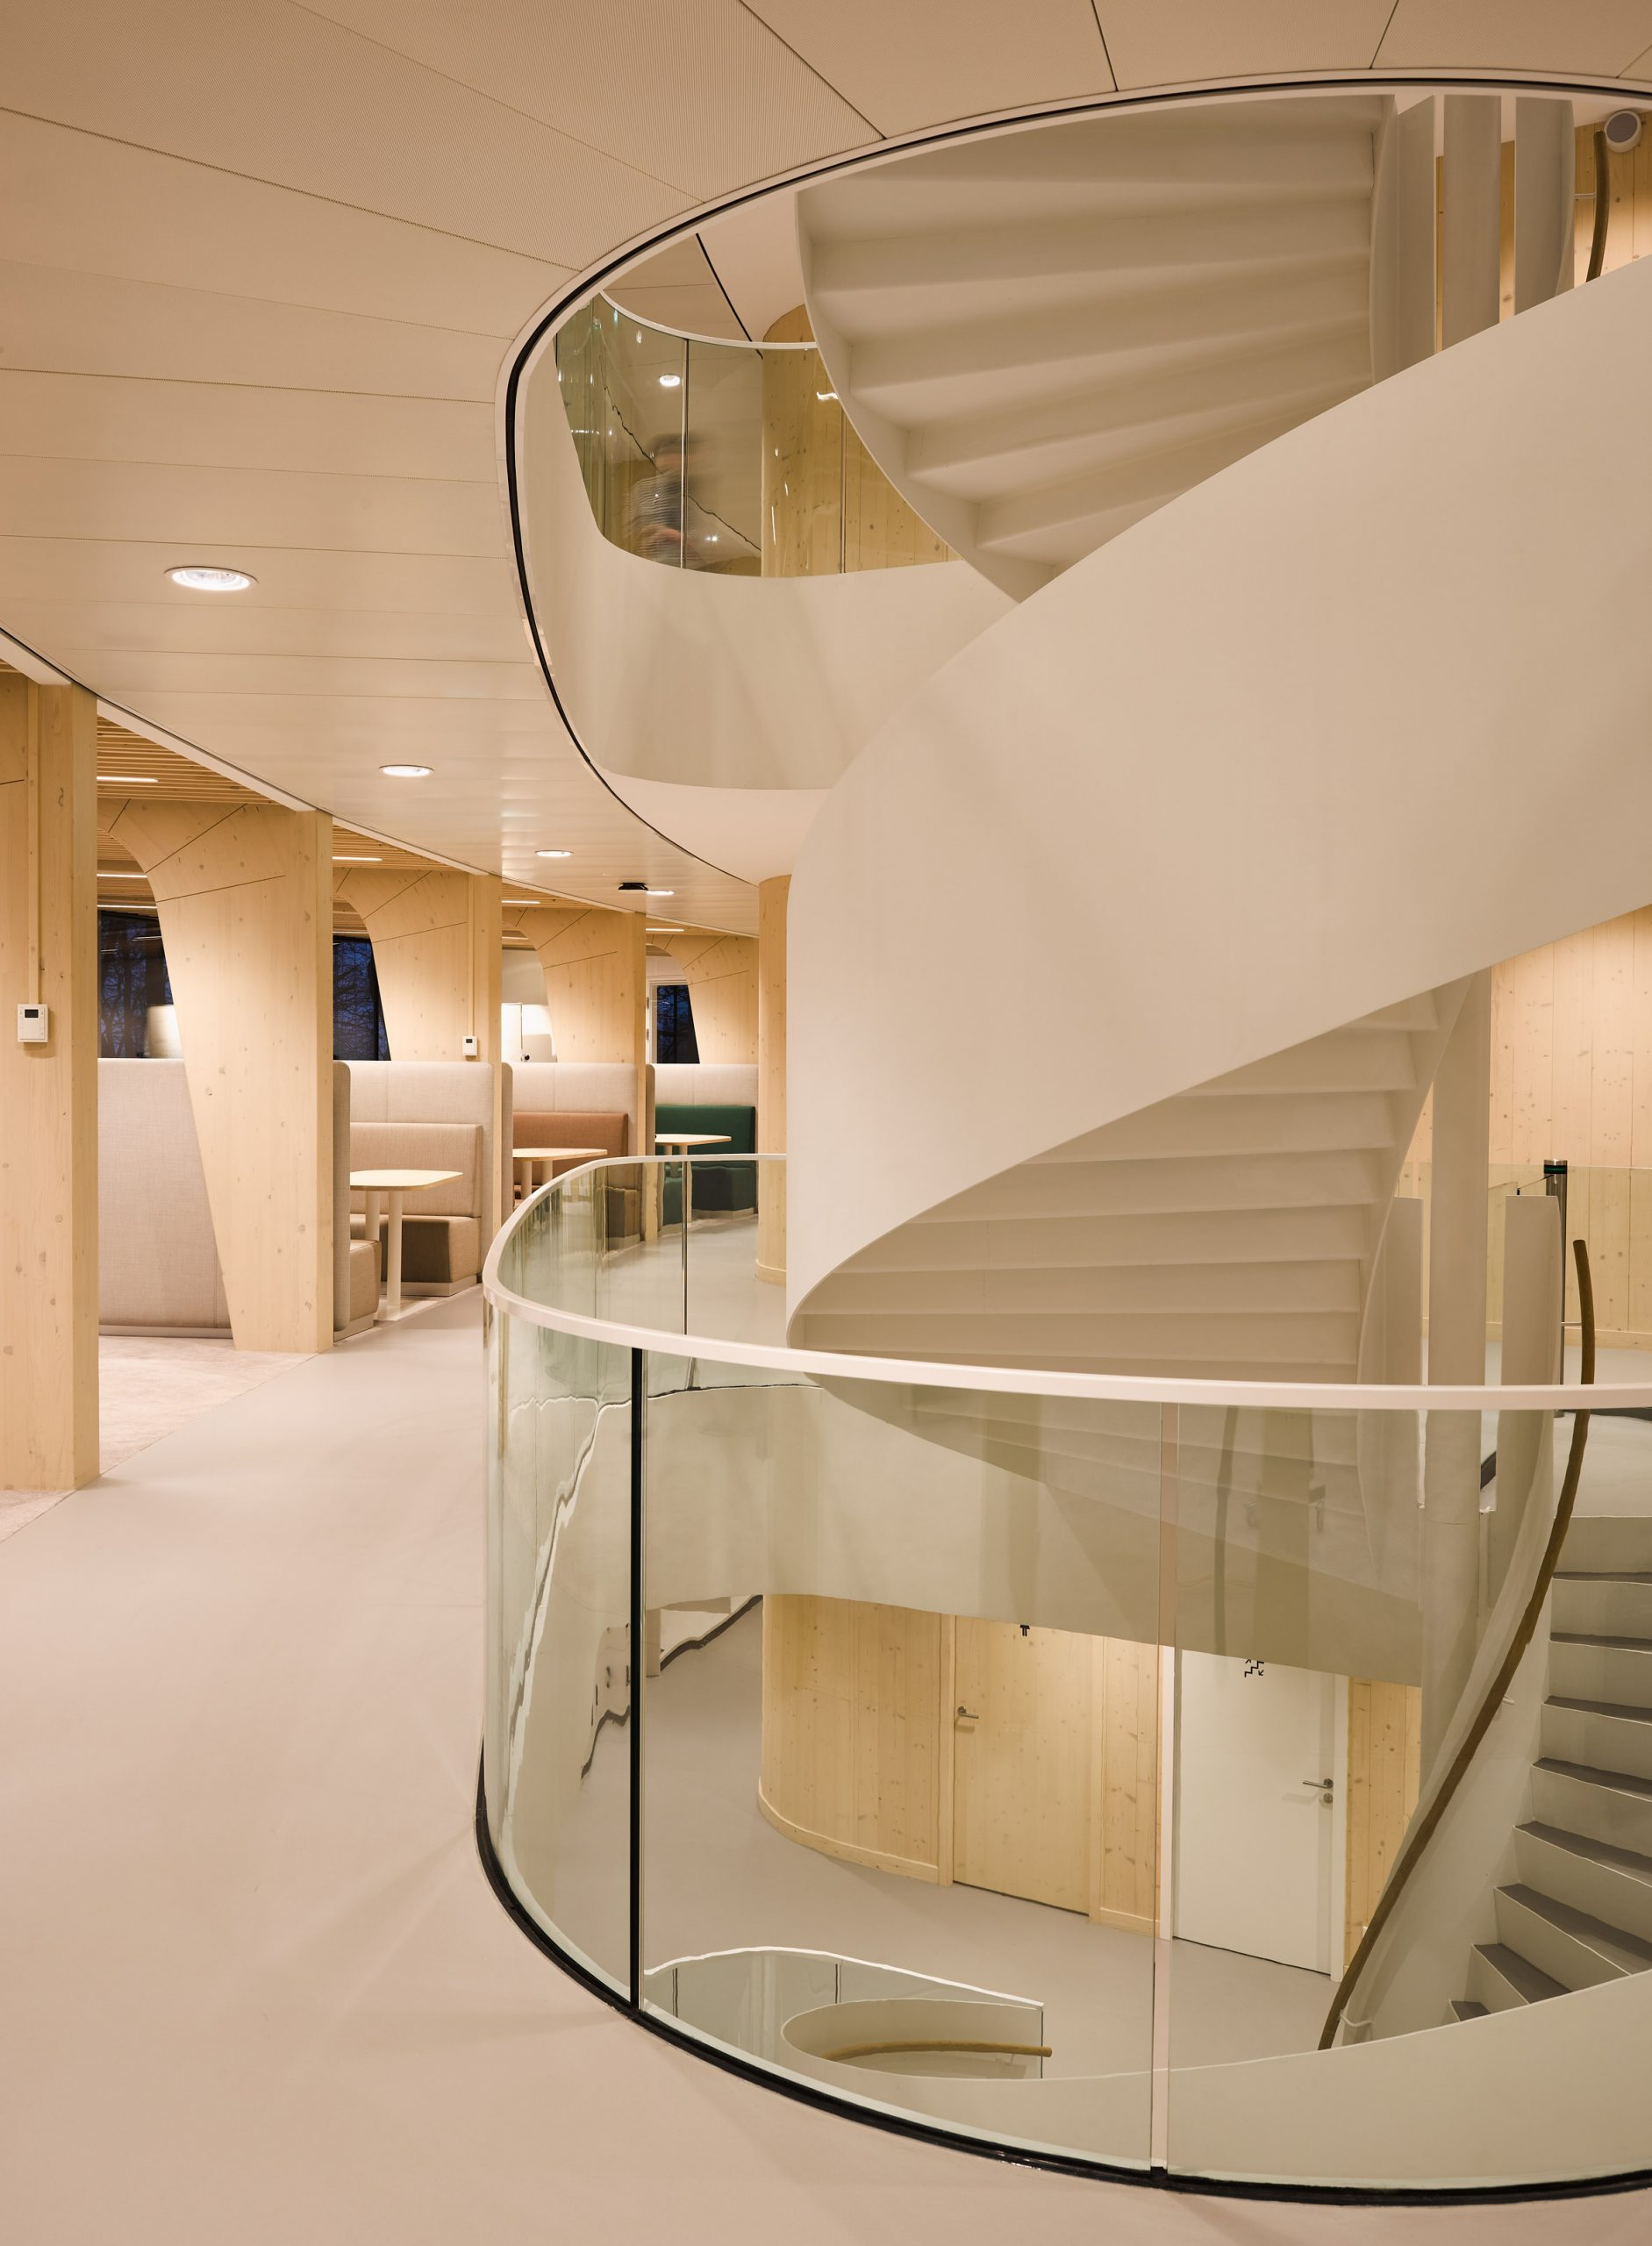 A white spiral staircase